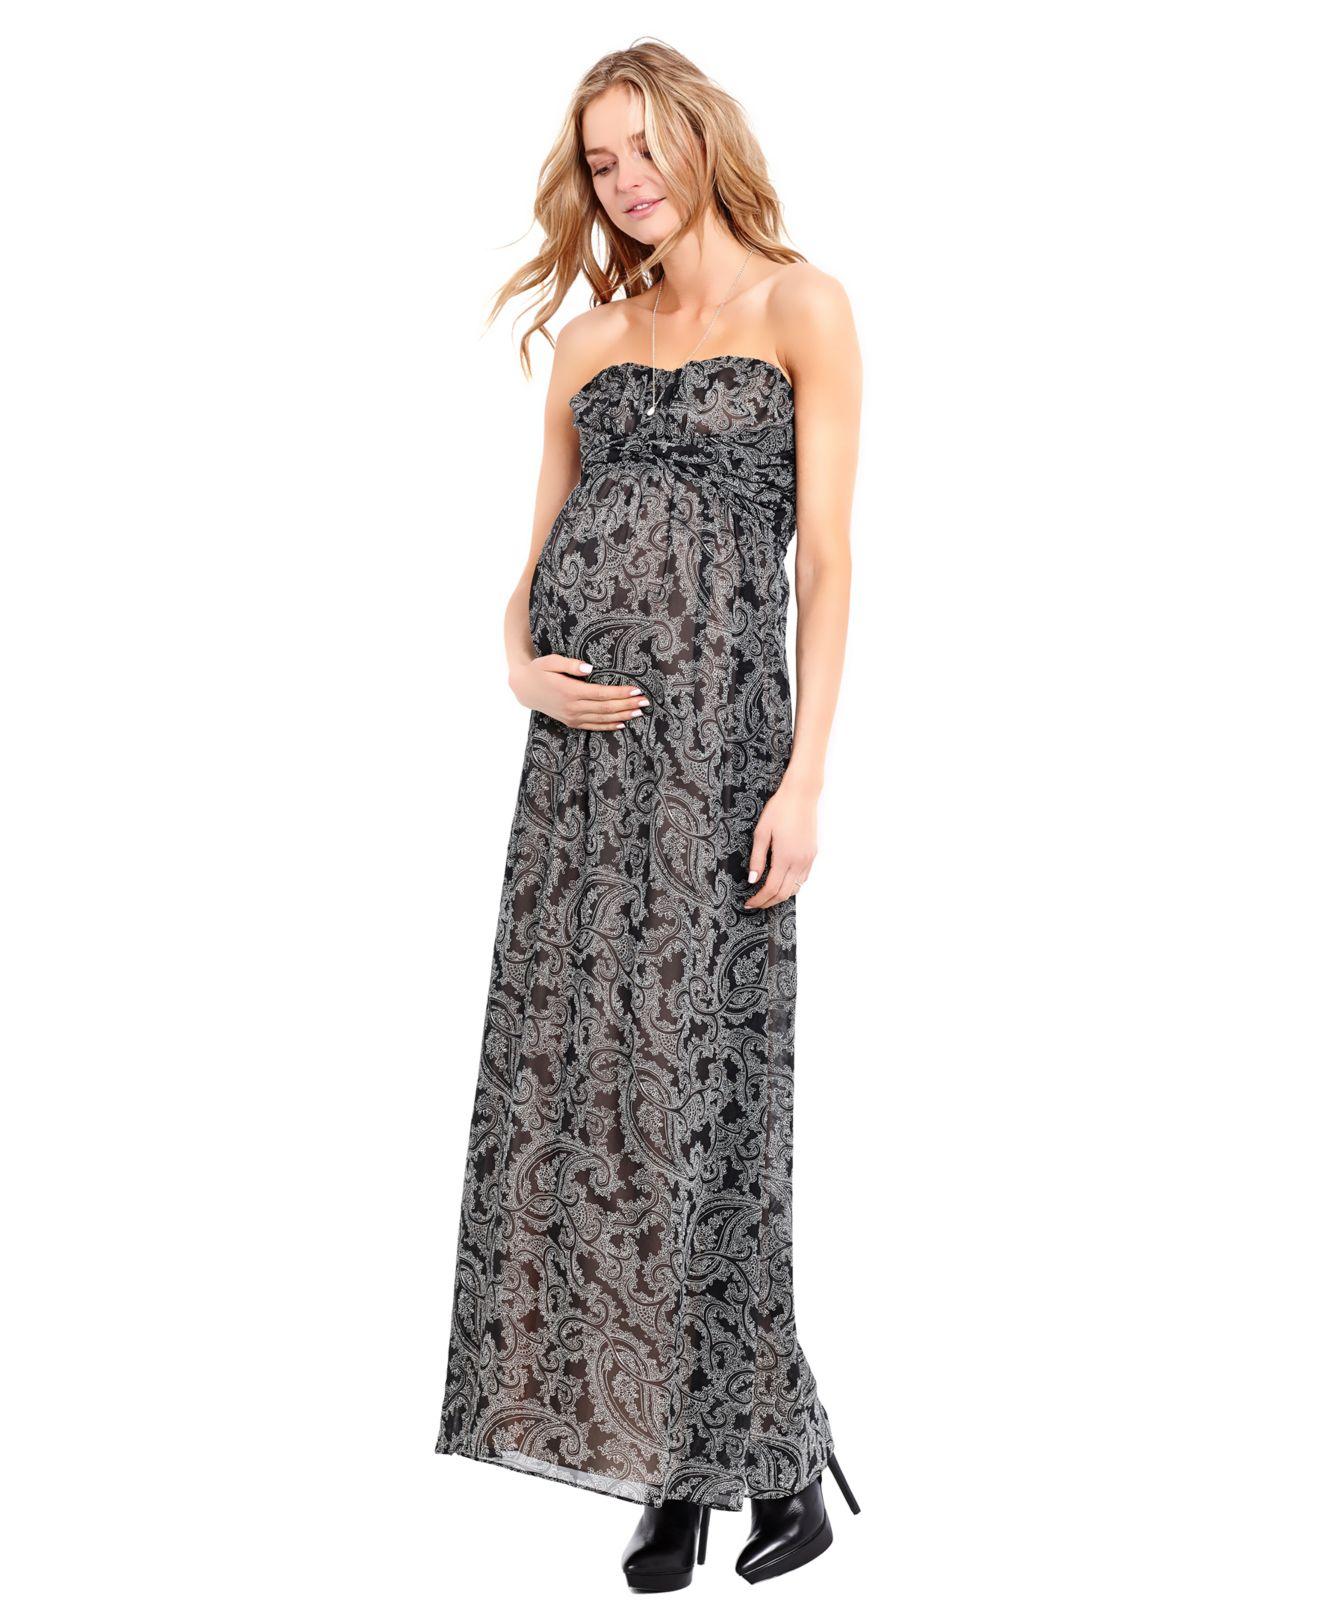 9f4c3286da0 Jessica Simpson Ruffled Maternity Dress - Photo Dress Wallpaper HD AOrg